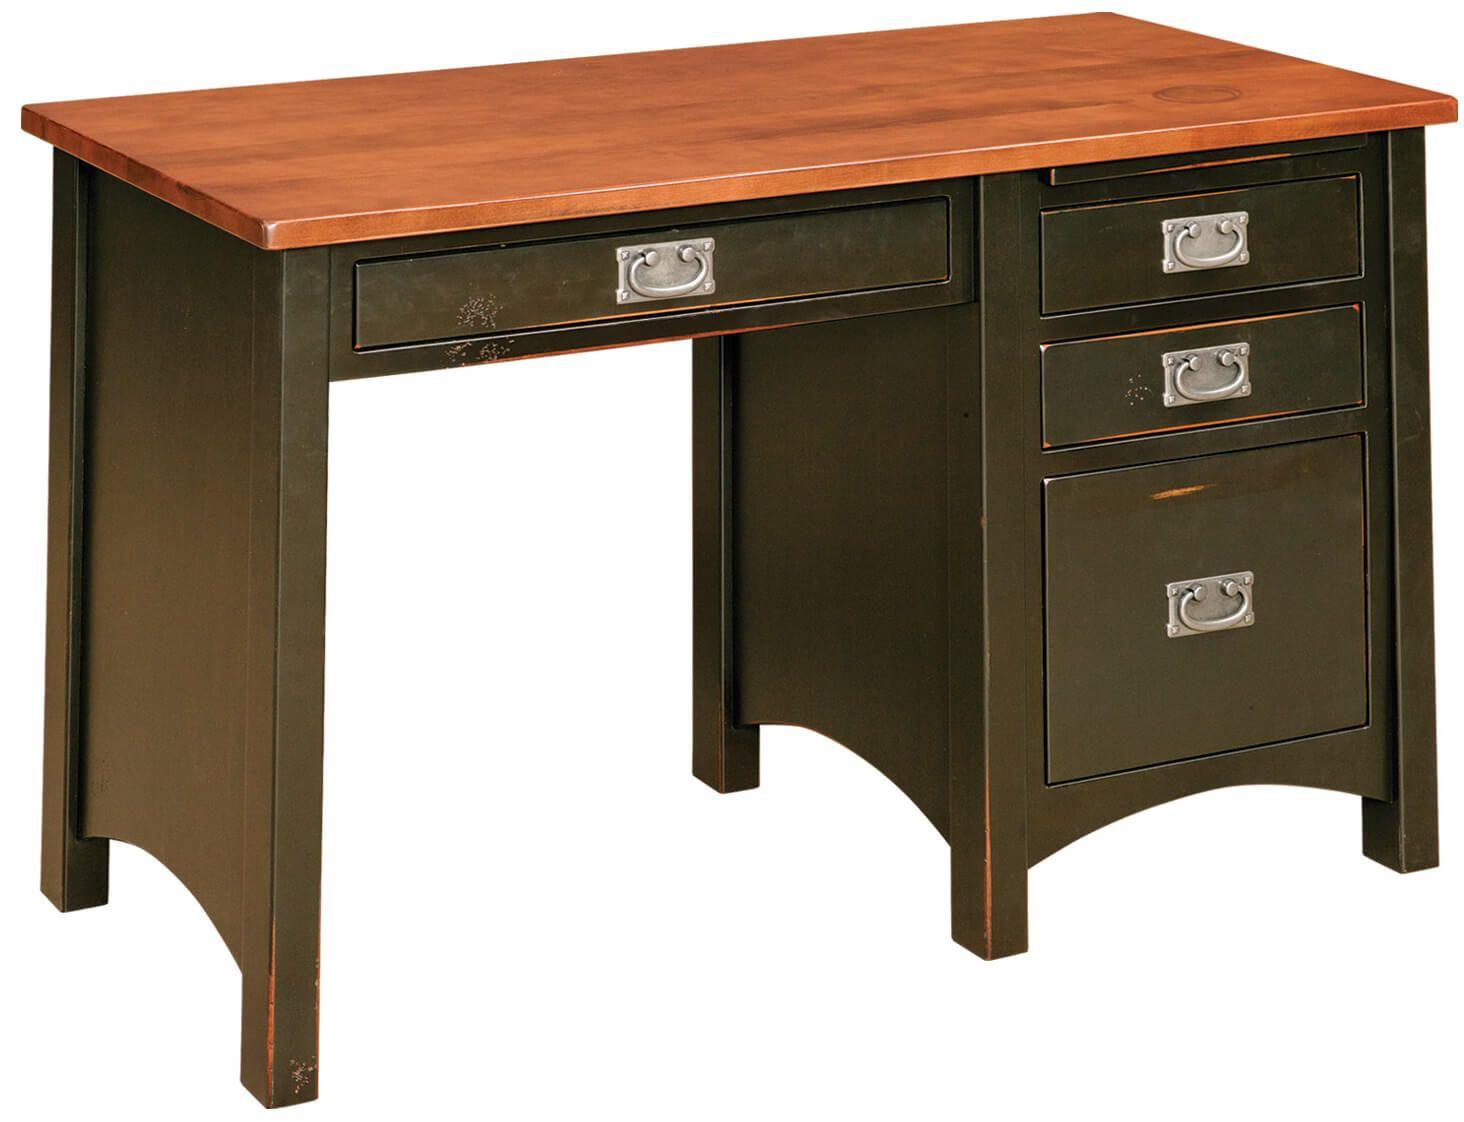 Two-toned Austen Writing Desk